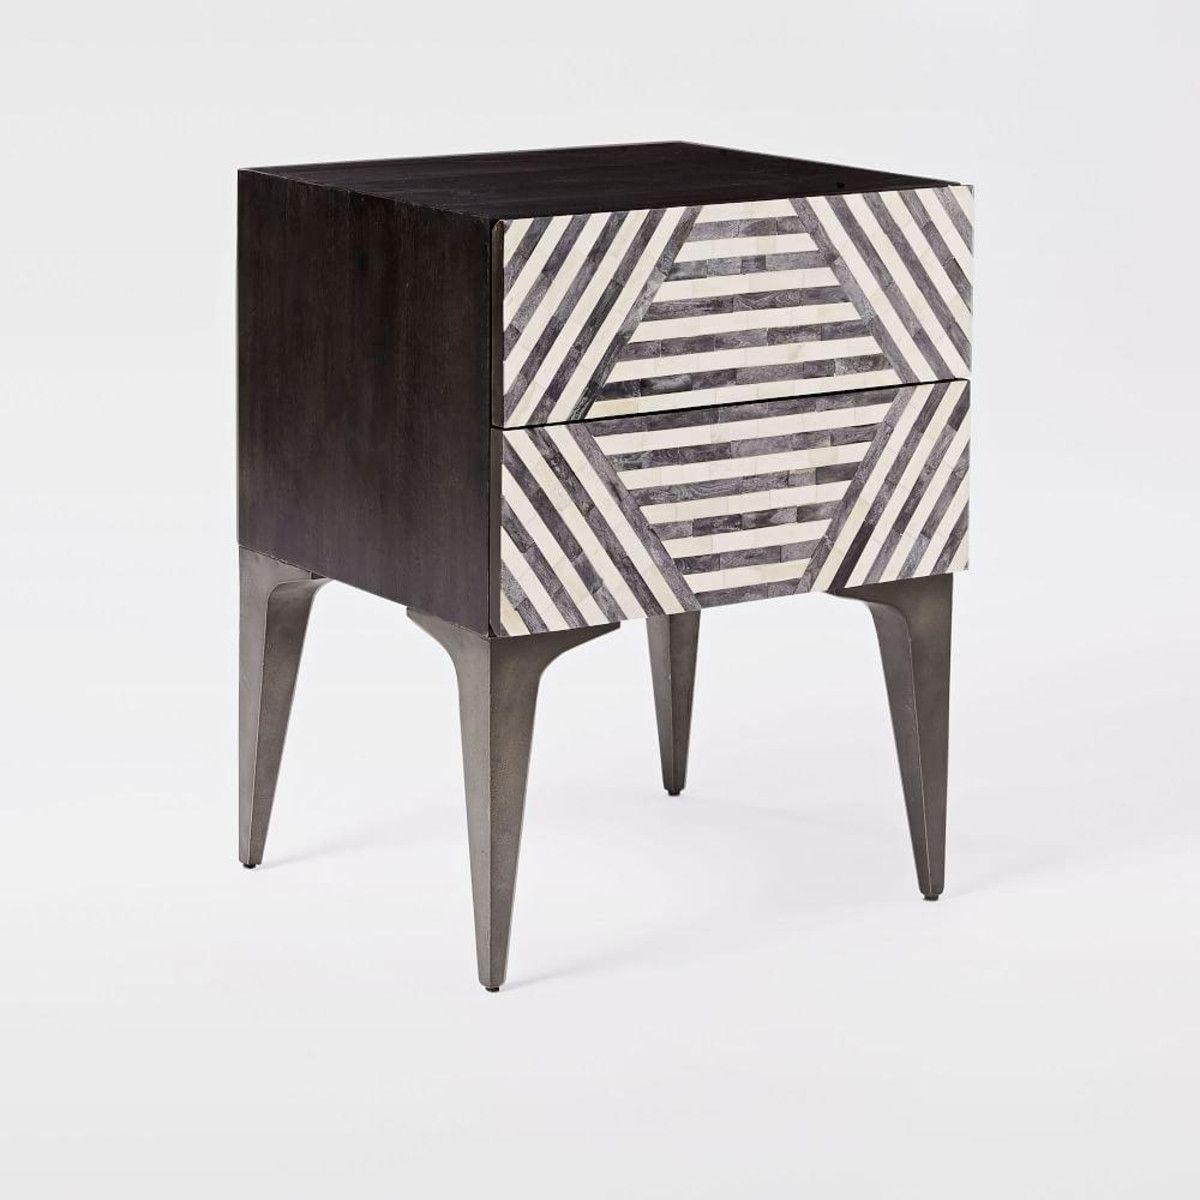 Bone inlay black u white bedside table stripe design in decor